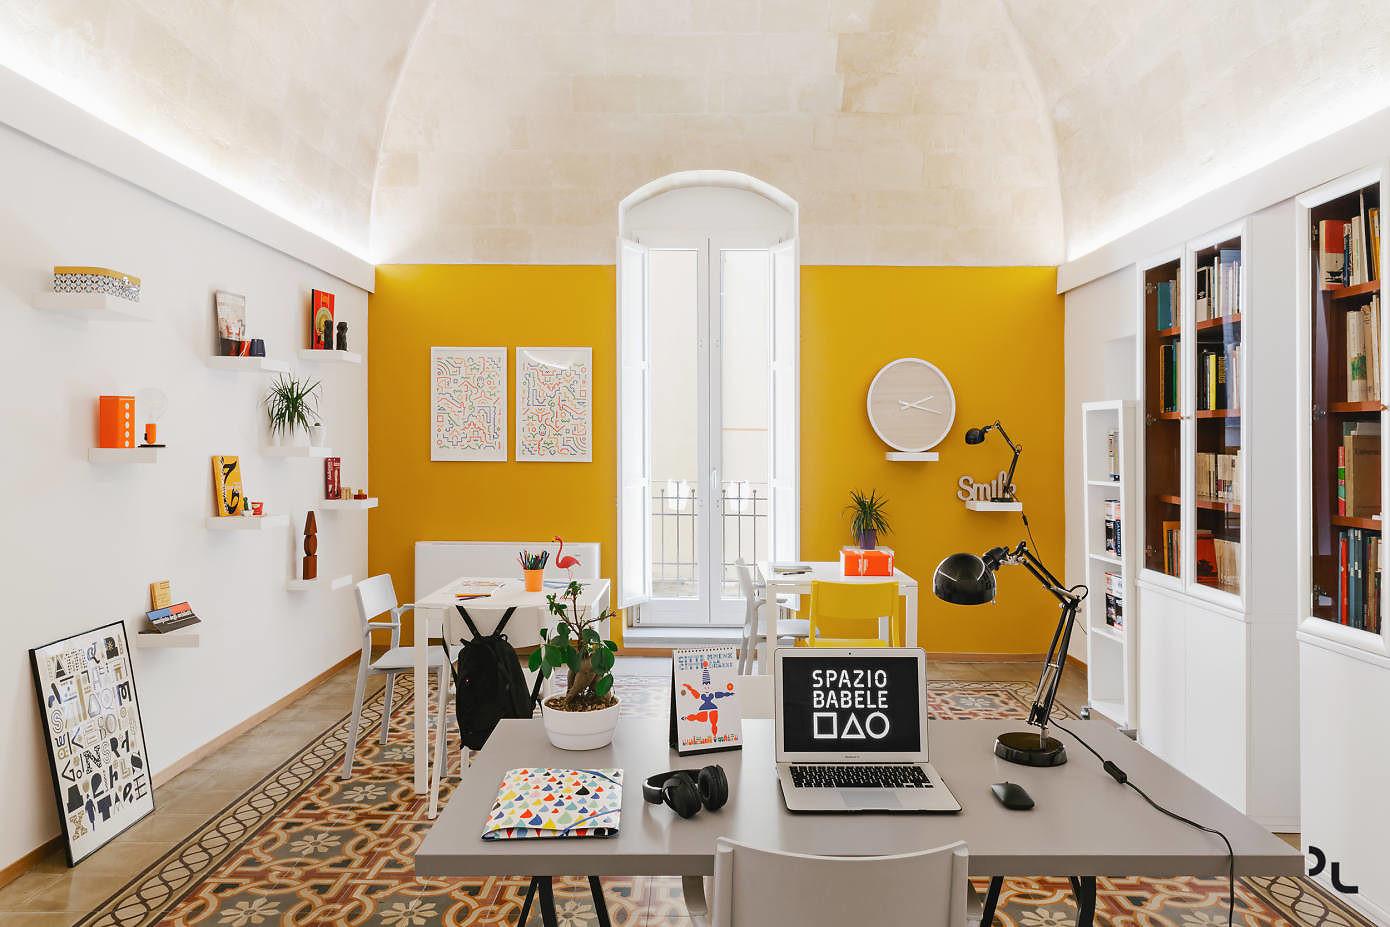 Apartment in Montescaglioso by Marima de Pace